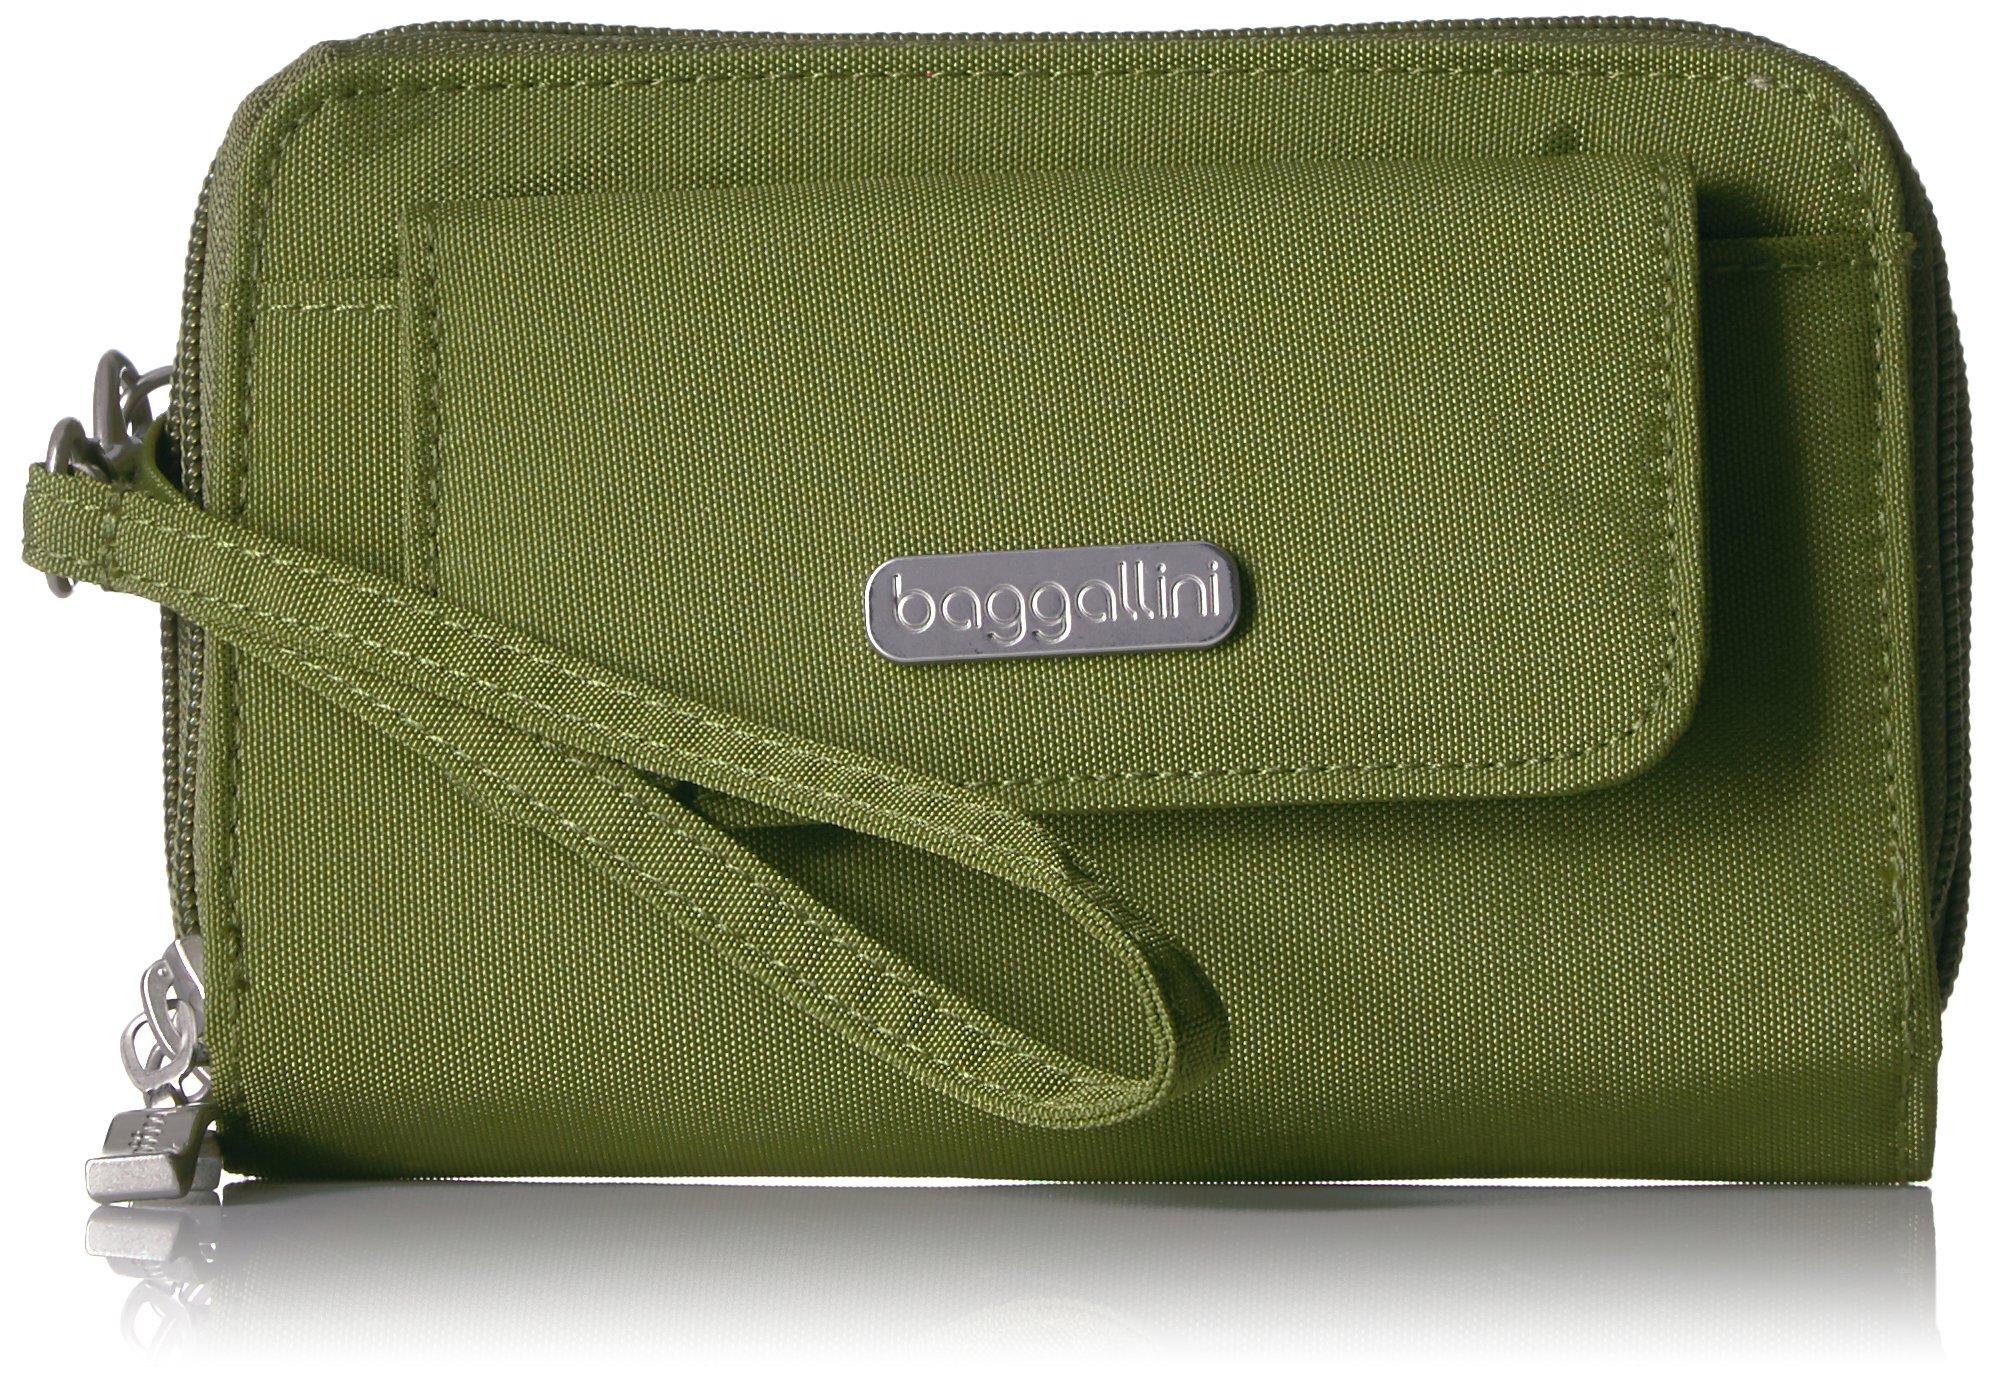 Baggallini Rfid Wallet Wristlet, Moss